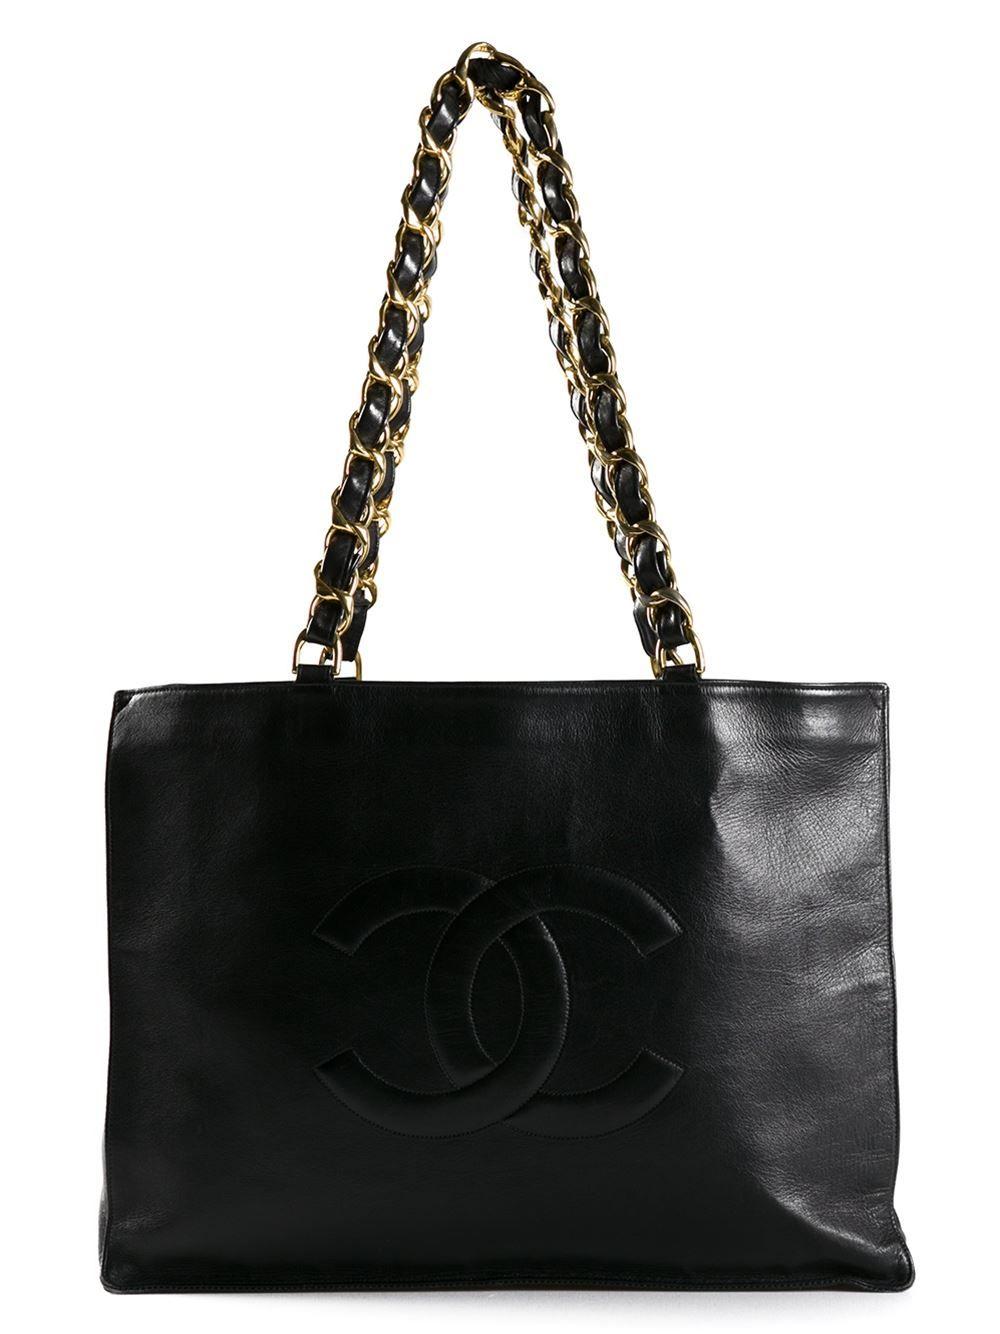 4fbec90d42f Chanel Vintage Vintage Shopper Tote - Bella Bag - Farfetch.com